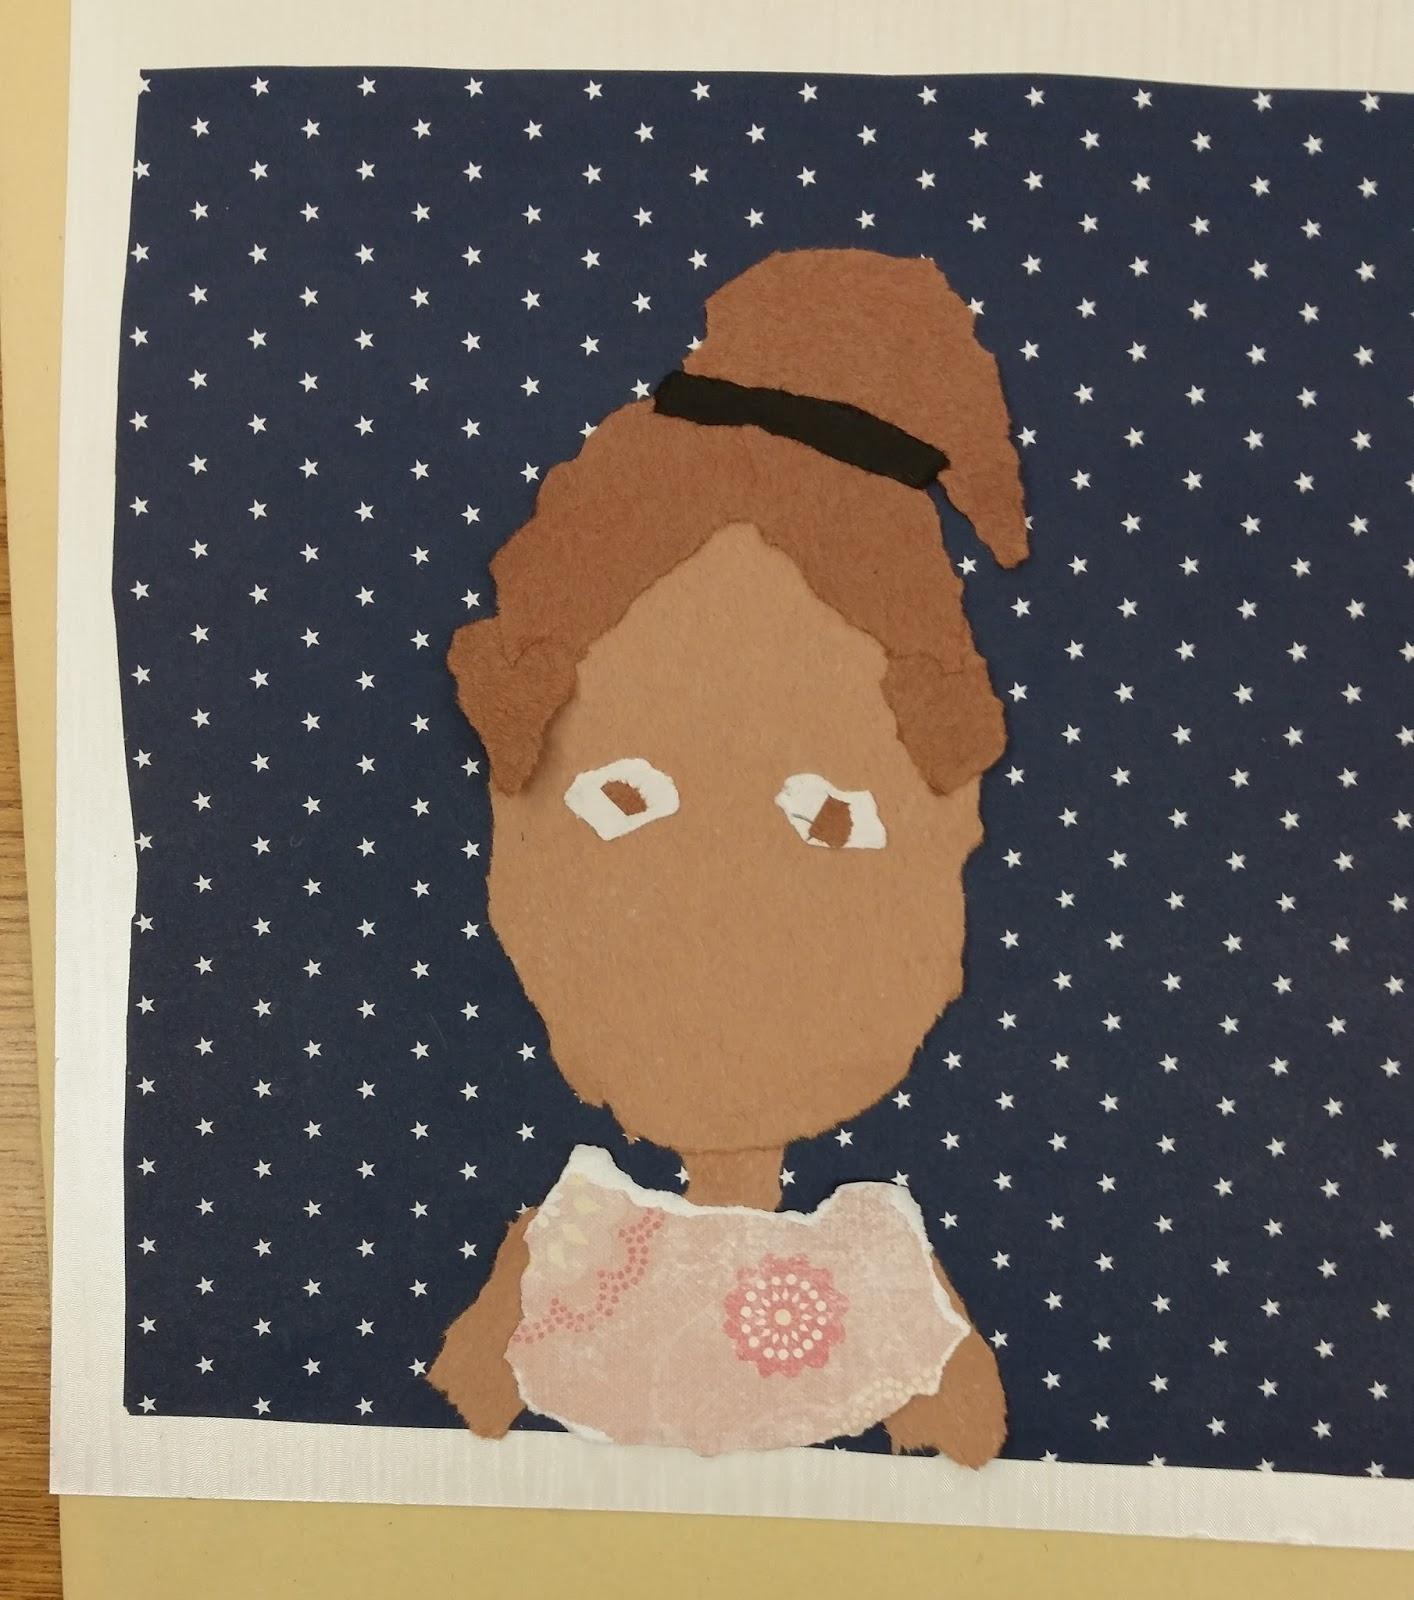 Welcome To Ms Wagner S Elementary Art Studio: The David Lubin Art Studio: Mini Selfies